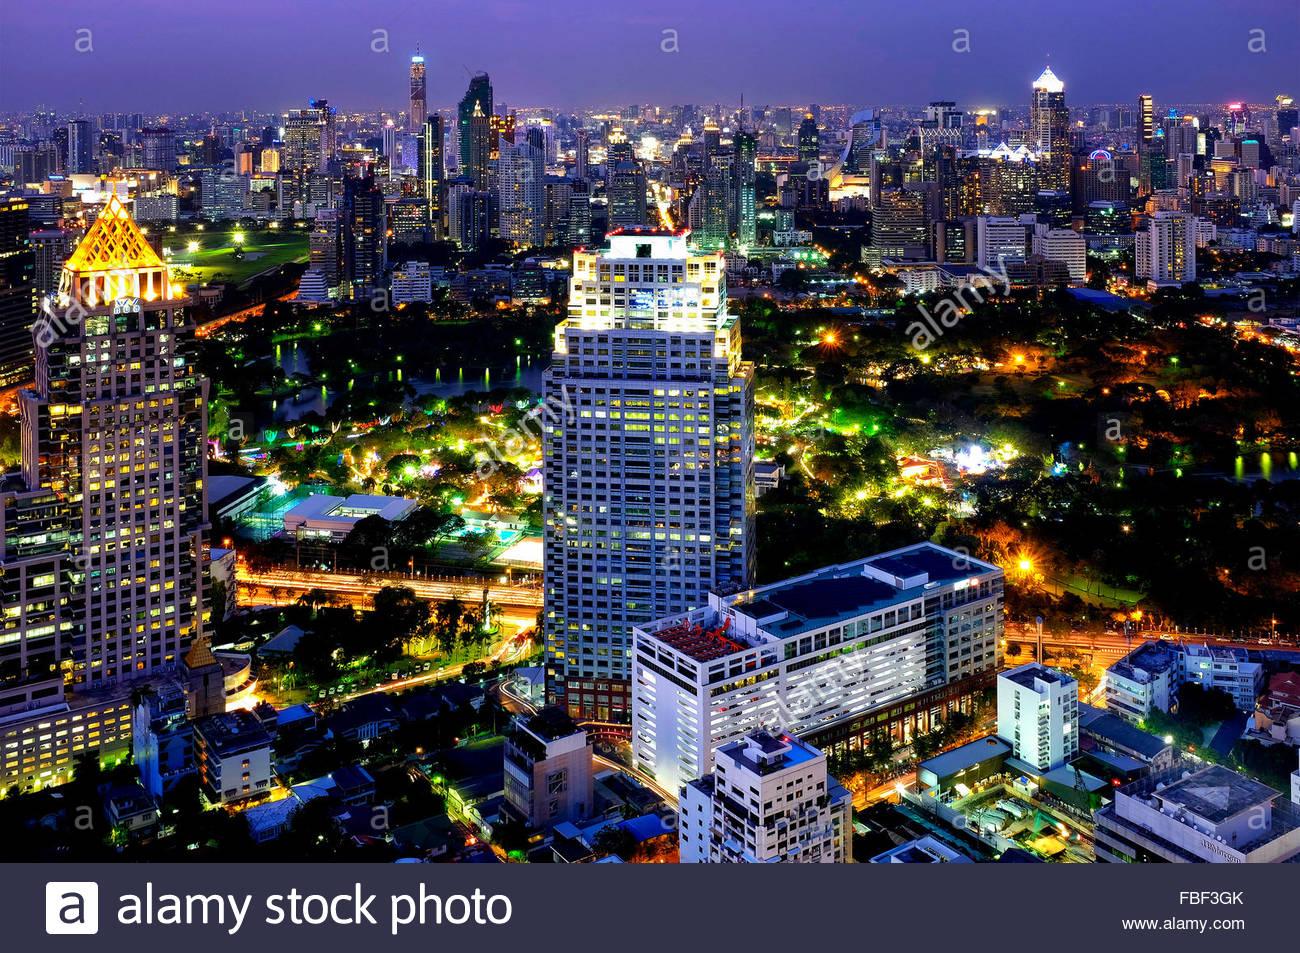 Vue sur le Parc Lumphini du Moon Bar de l'hôtel Banyan Tree Bangkok, Thaïlande , Photo Stock